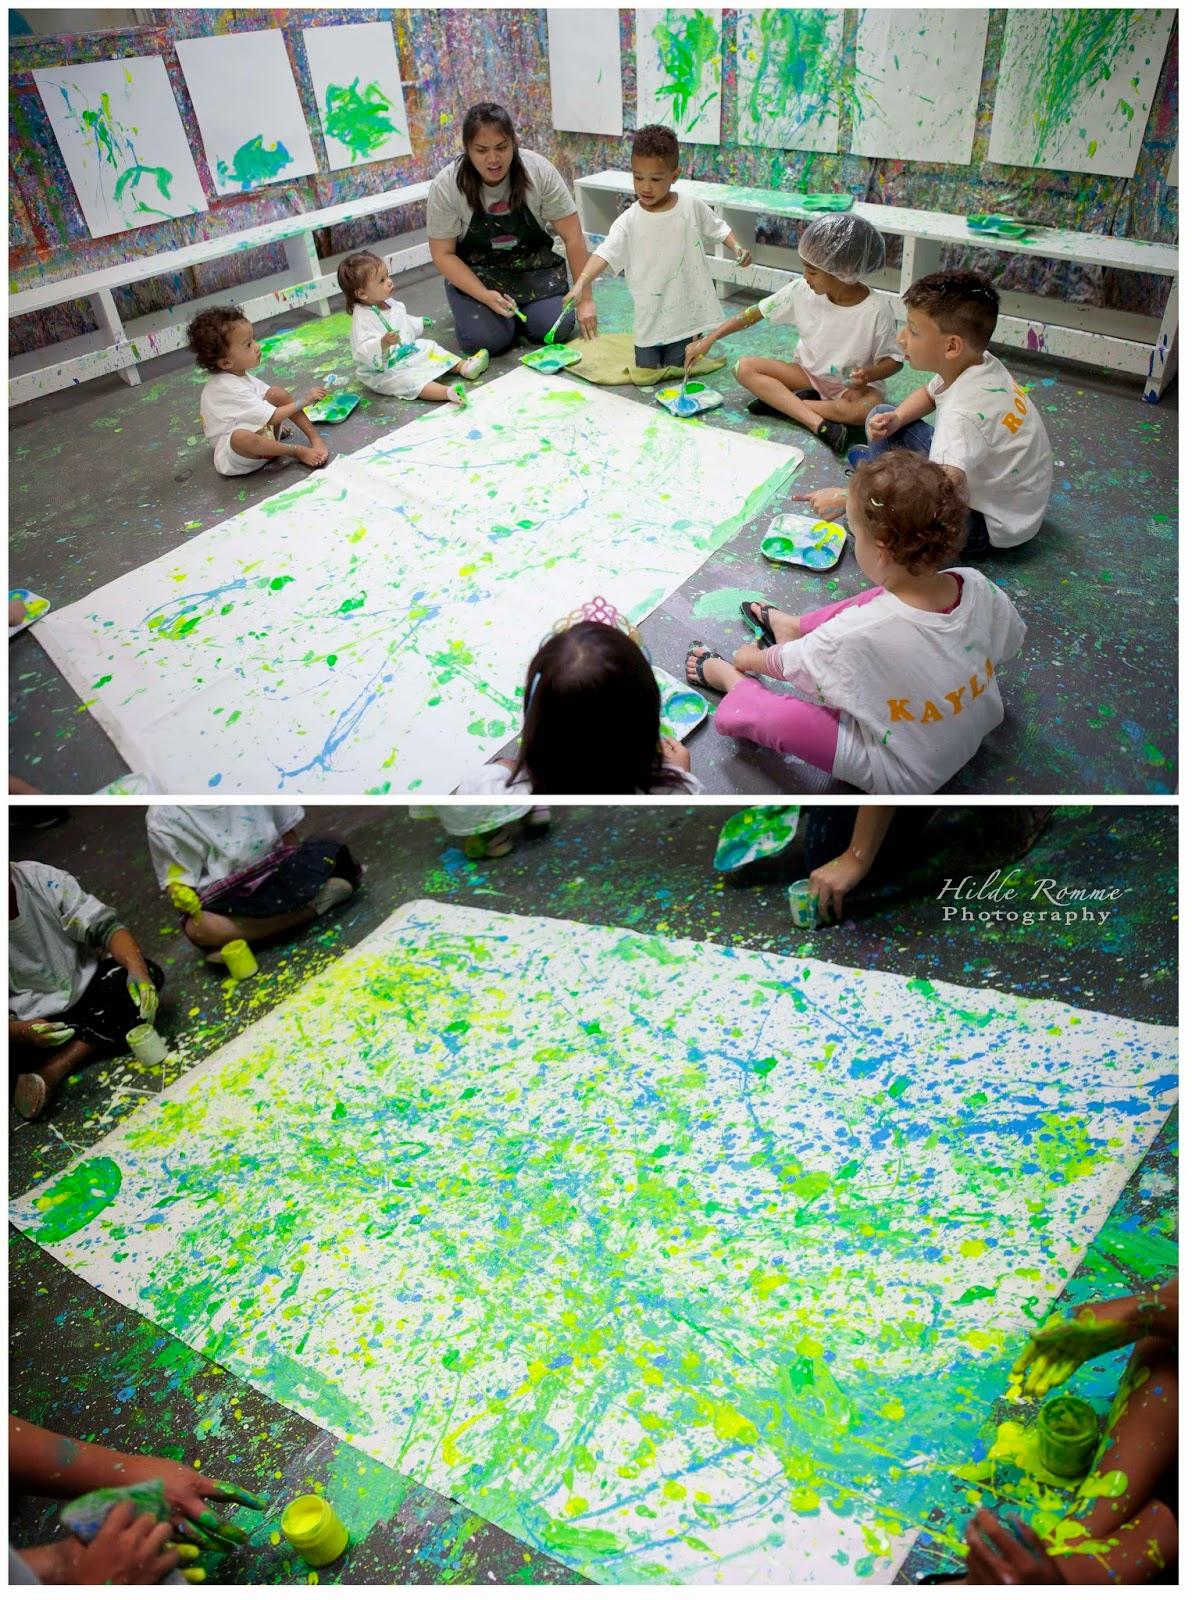 Cats Paint Splatter Party Review